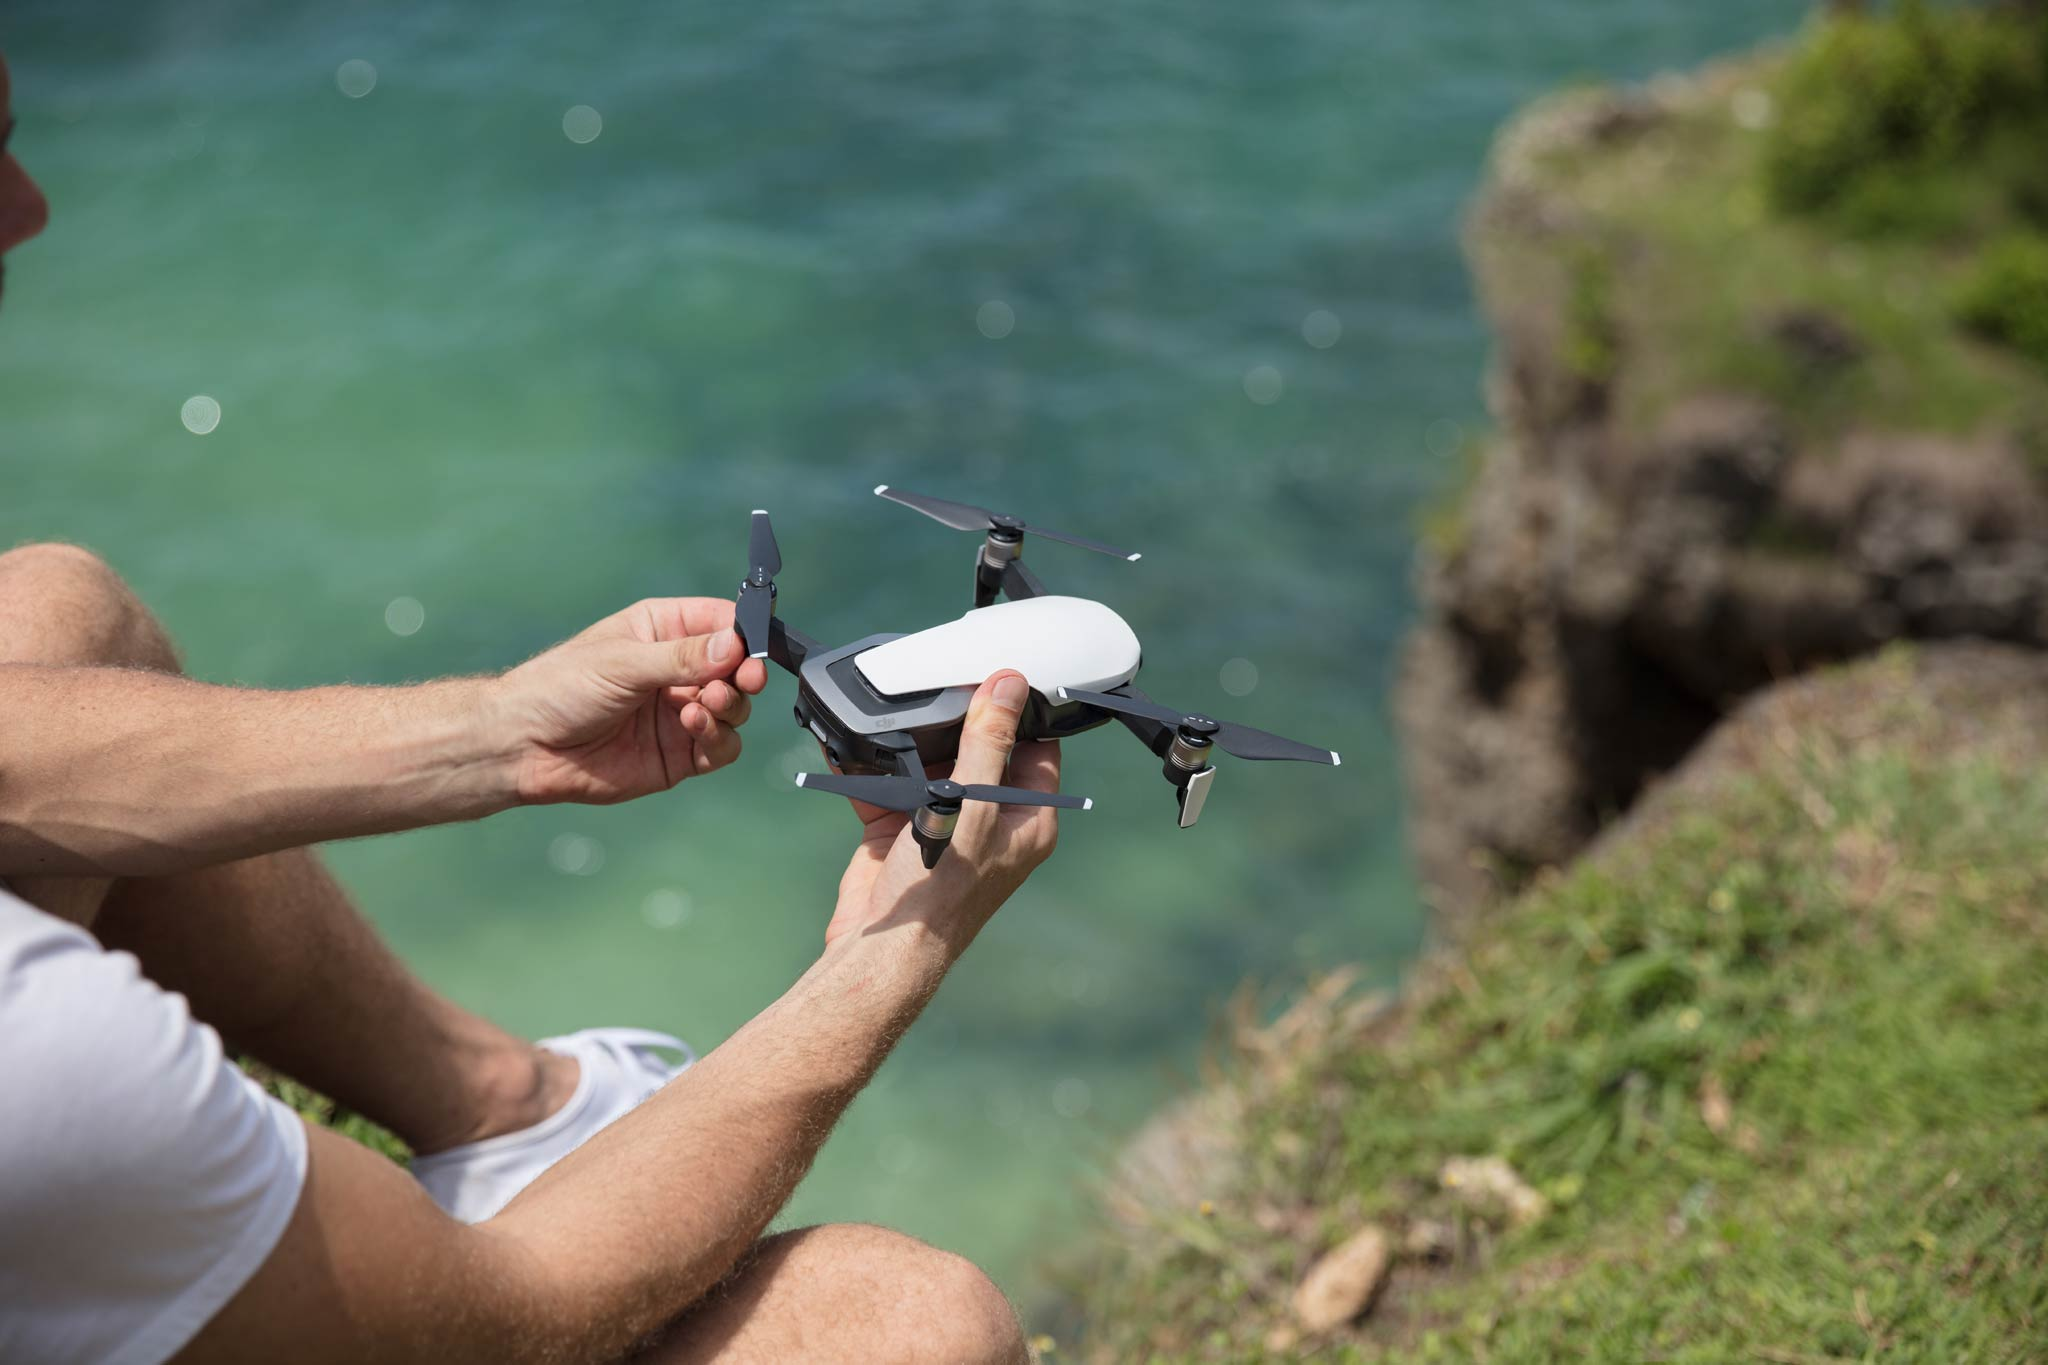 DJI stellt neue faltbare Drohne vor: Mavic Air